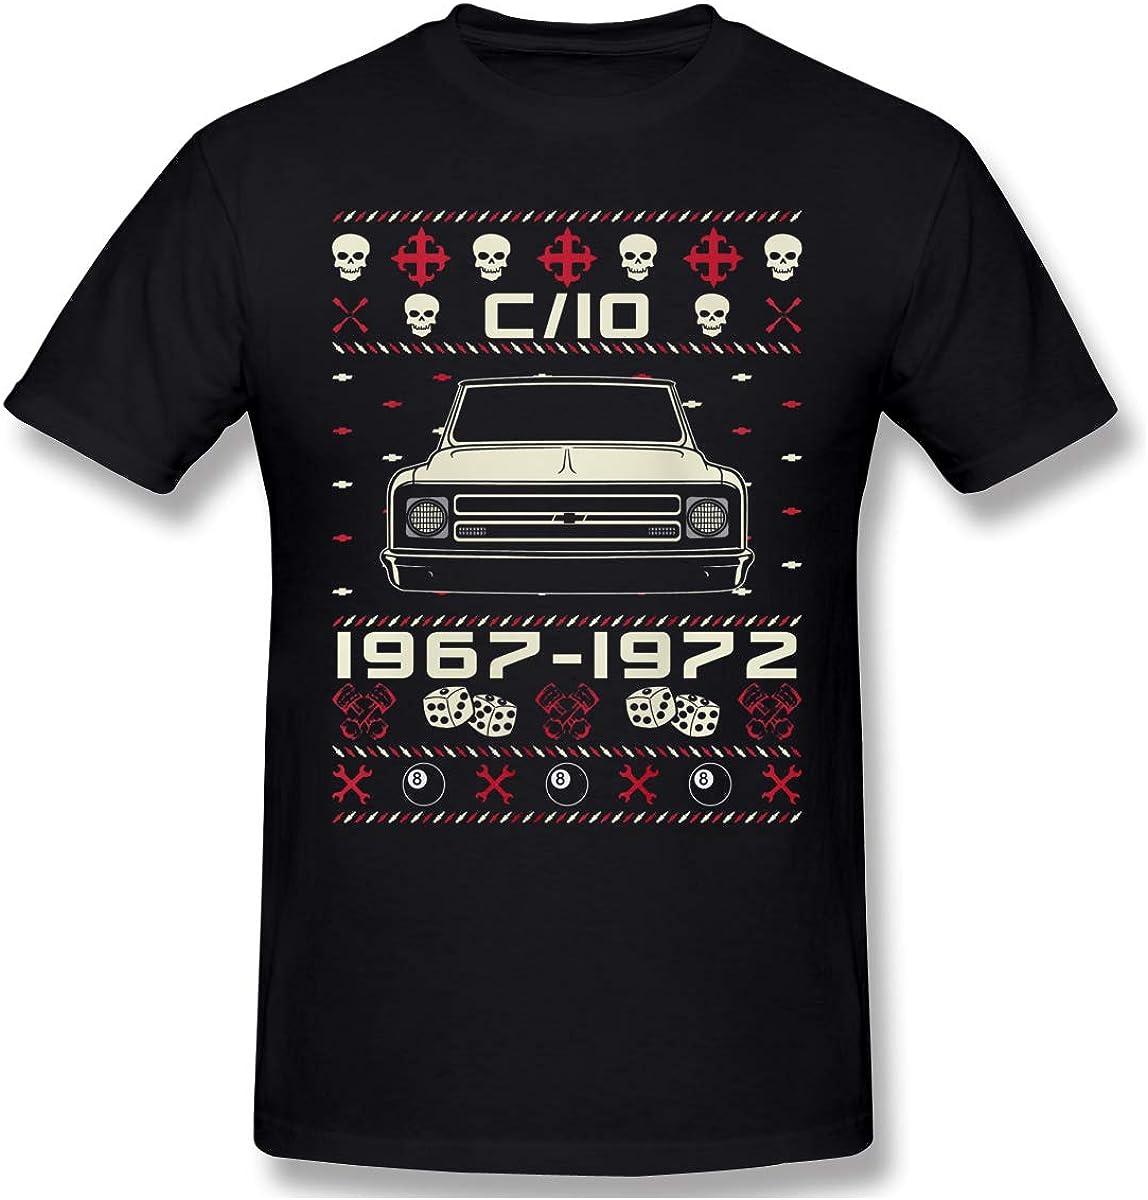 Hotrod C10 Built Not Bought Vintage 1970s Truck Tshirt